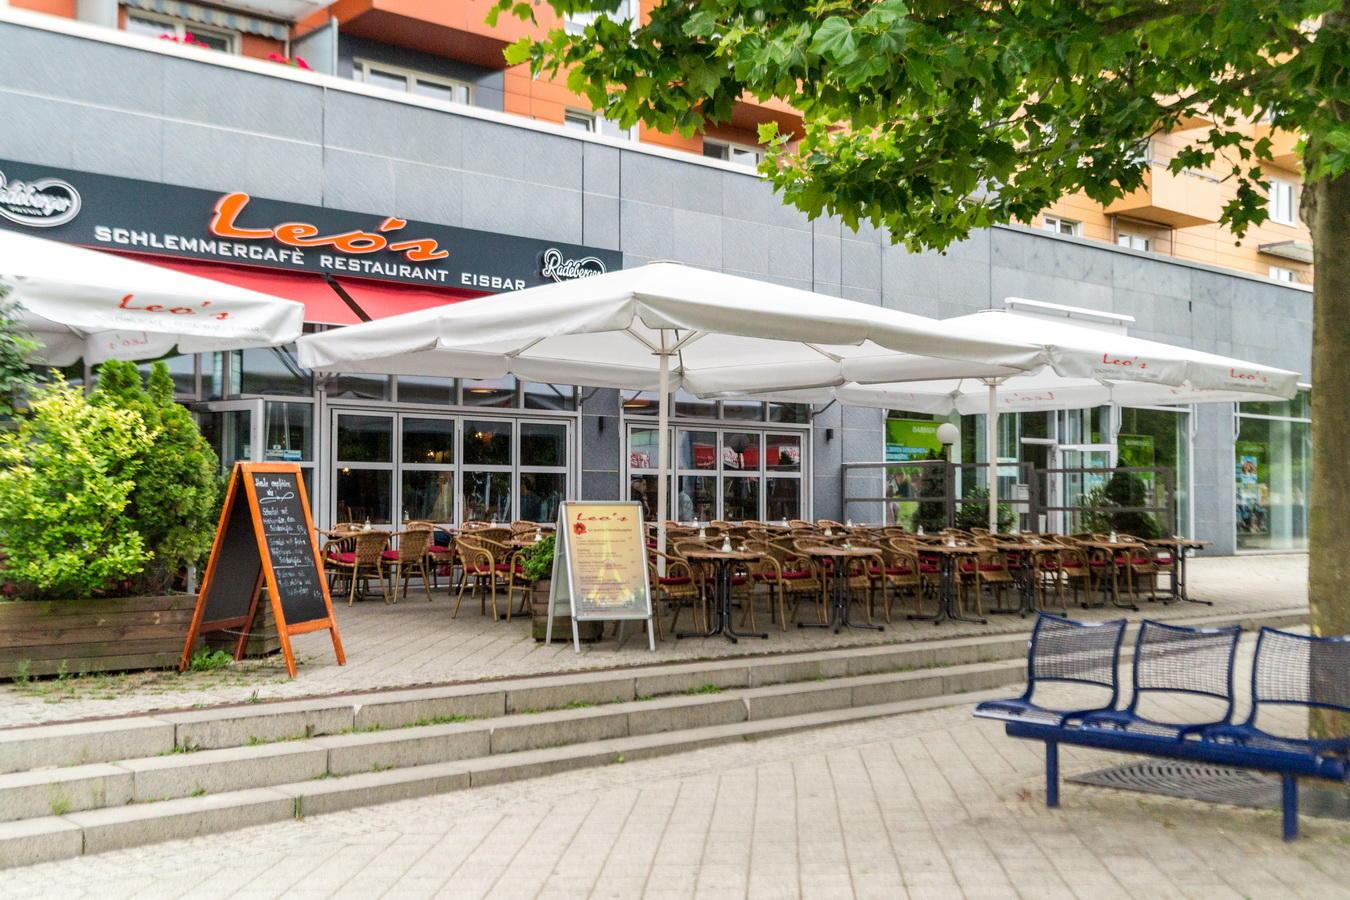 Bild der Leo's Schlemmer Café